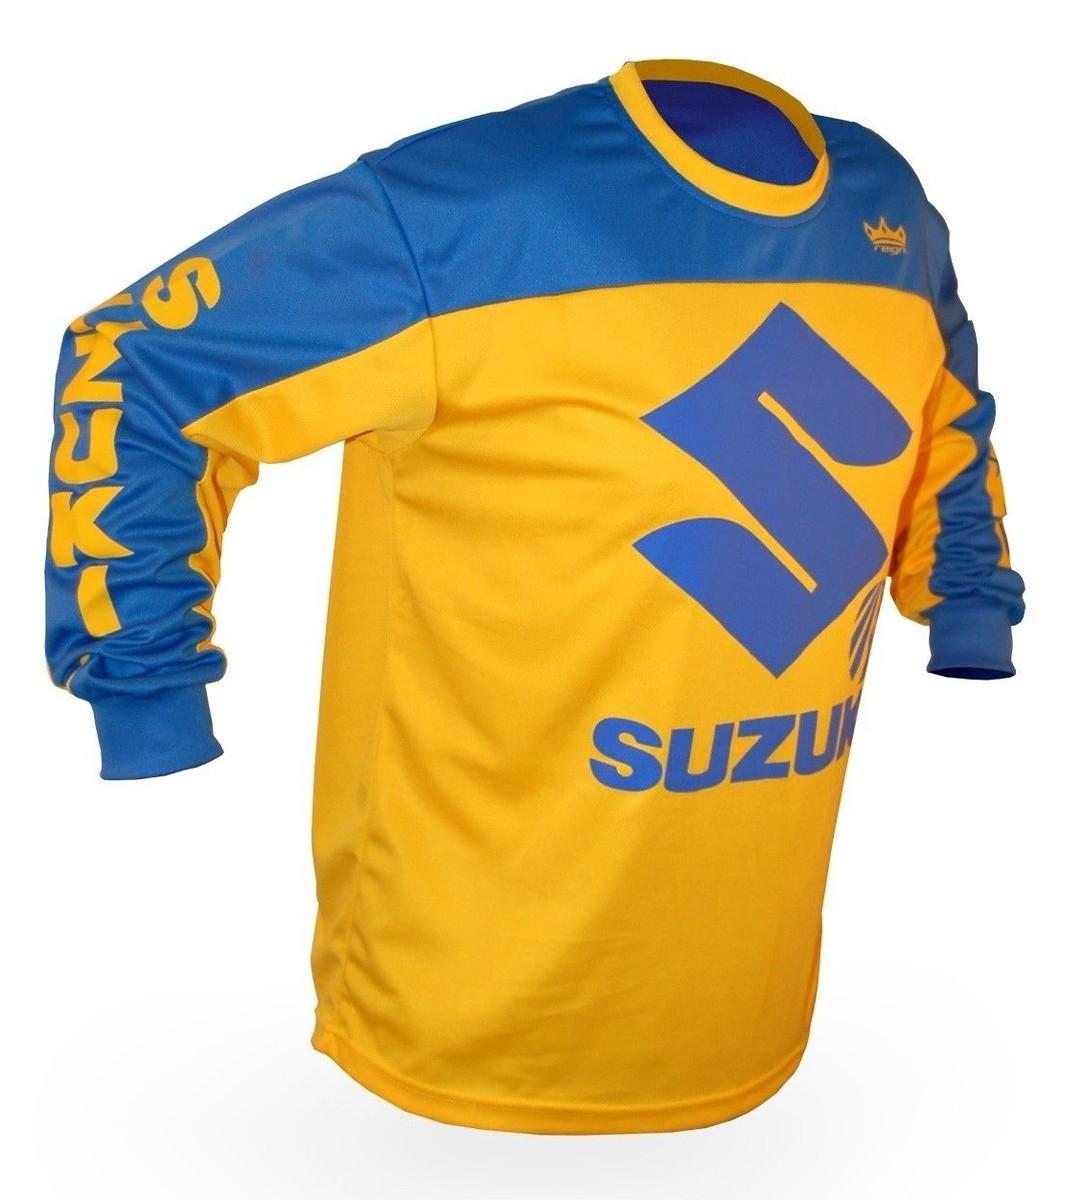 1979 suzuki jersey - old school moto - motocross forums / message